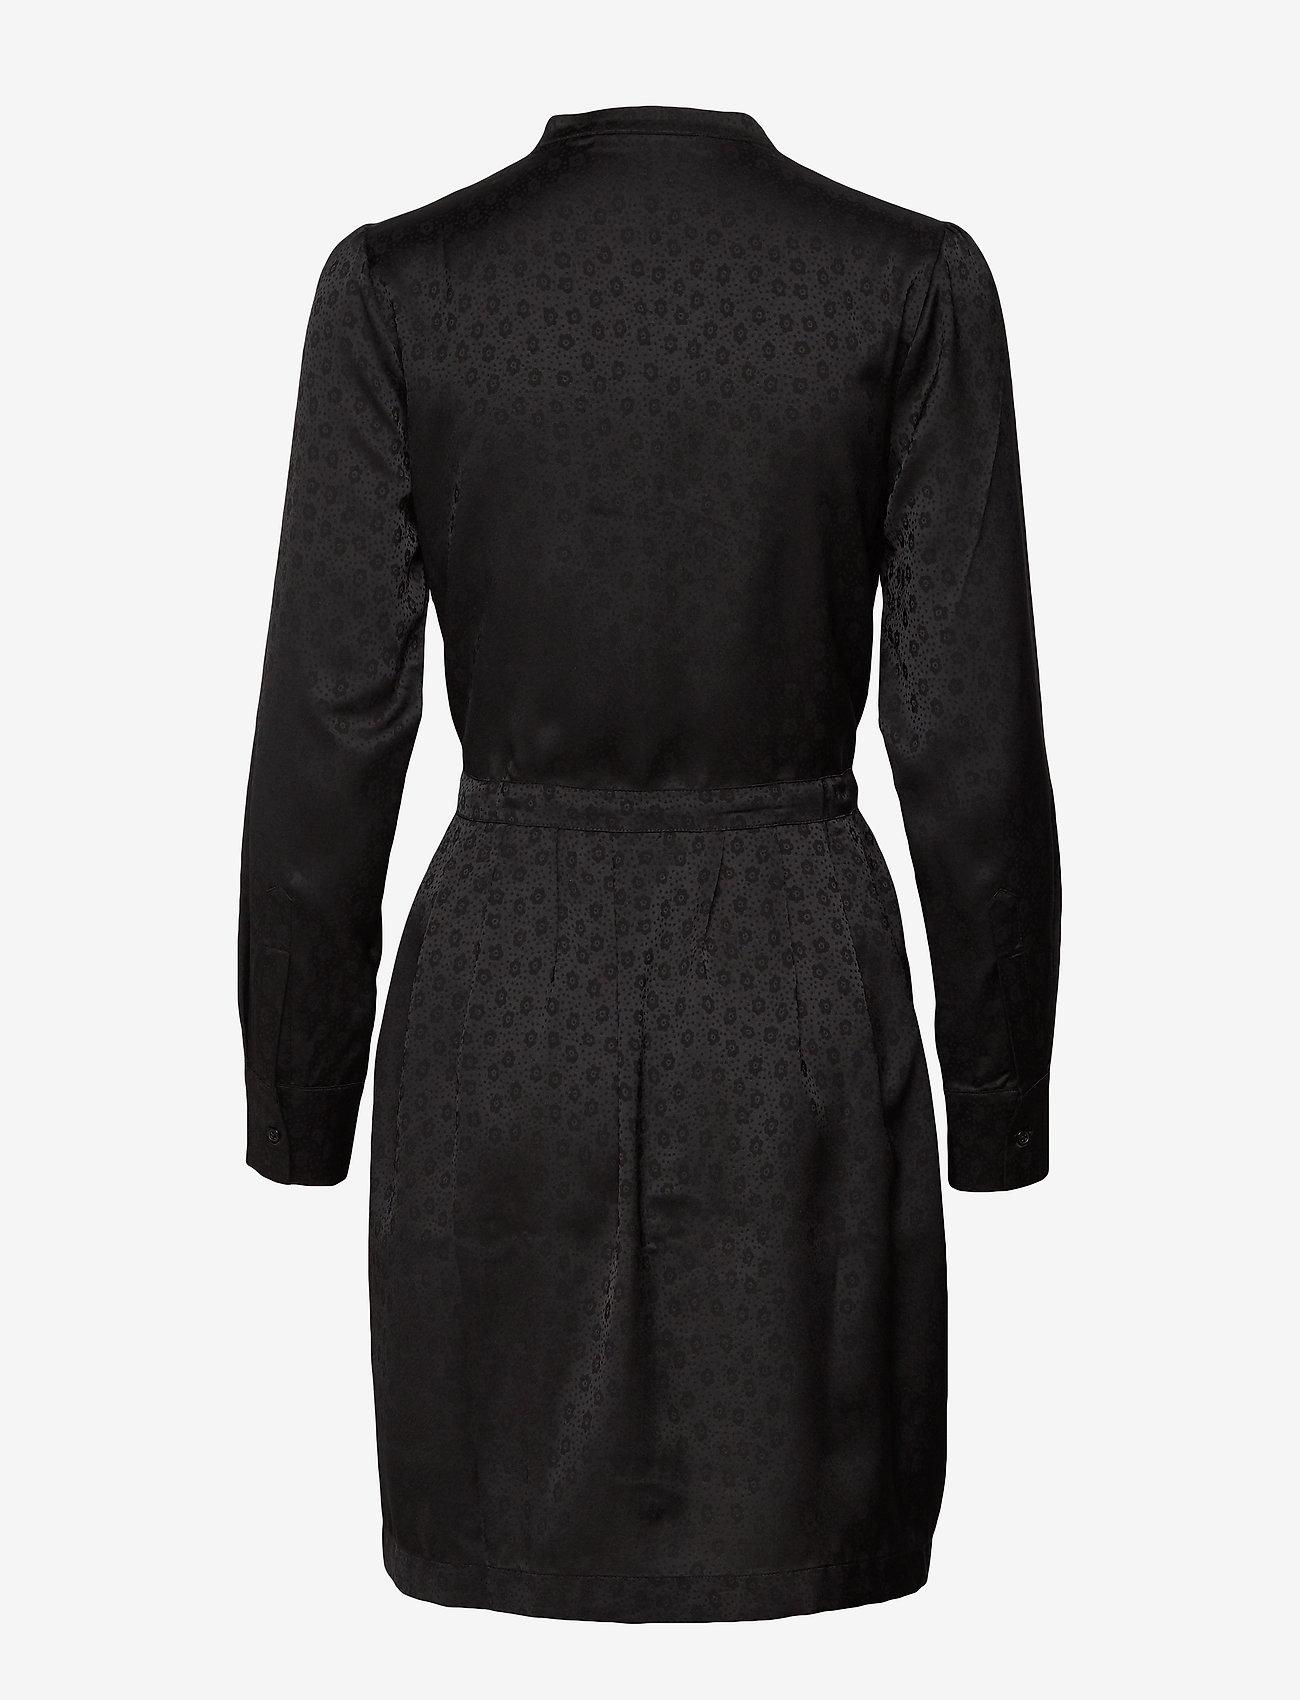 Samsøe Samsøe Monique shirt dress 11459 - Kleider BLACK - Damen Kleidung